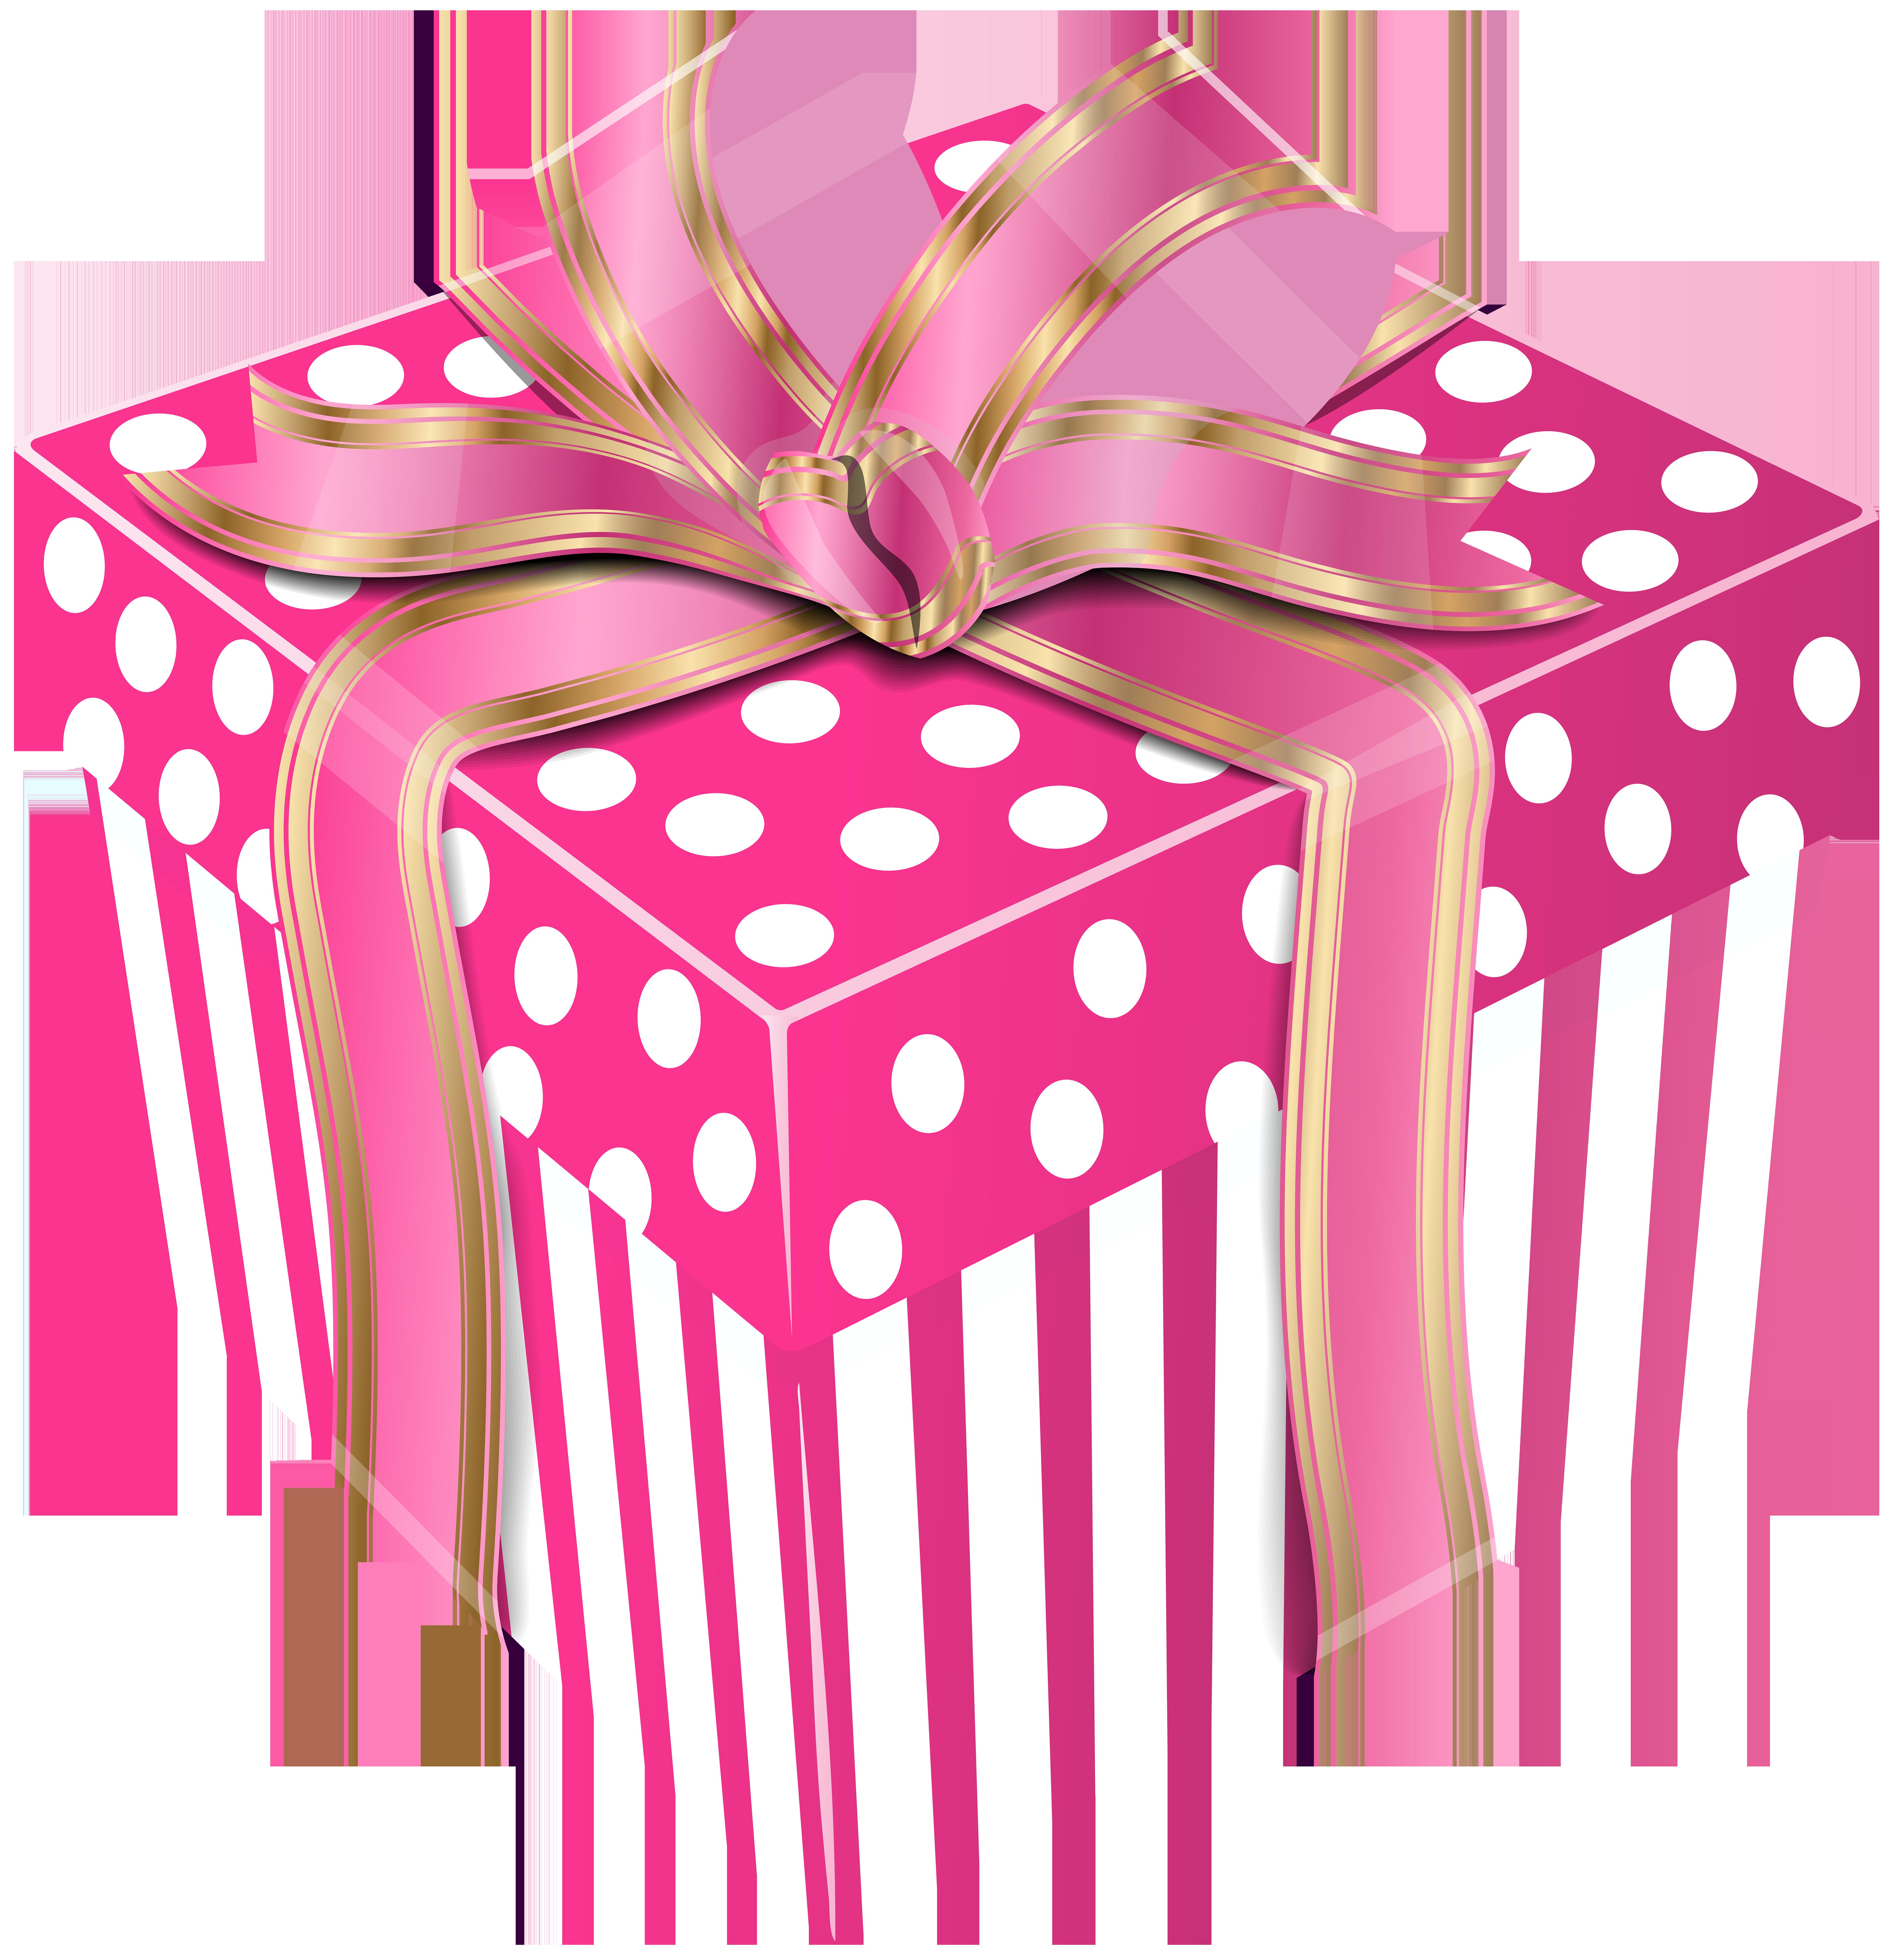 Clipart present polka dot. Pink gift graphics illustrations